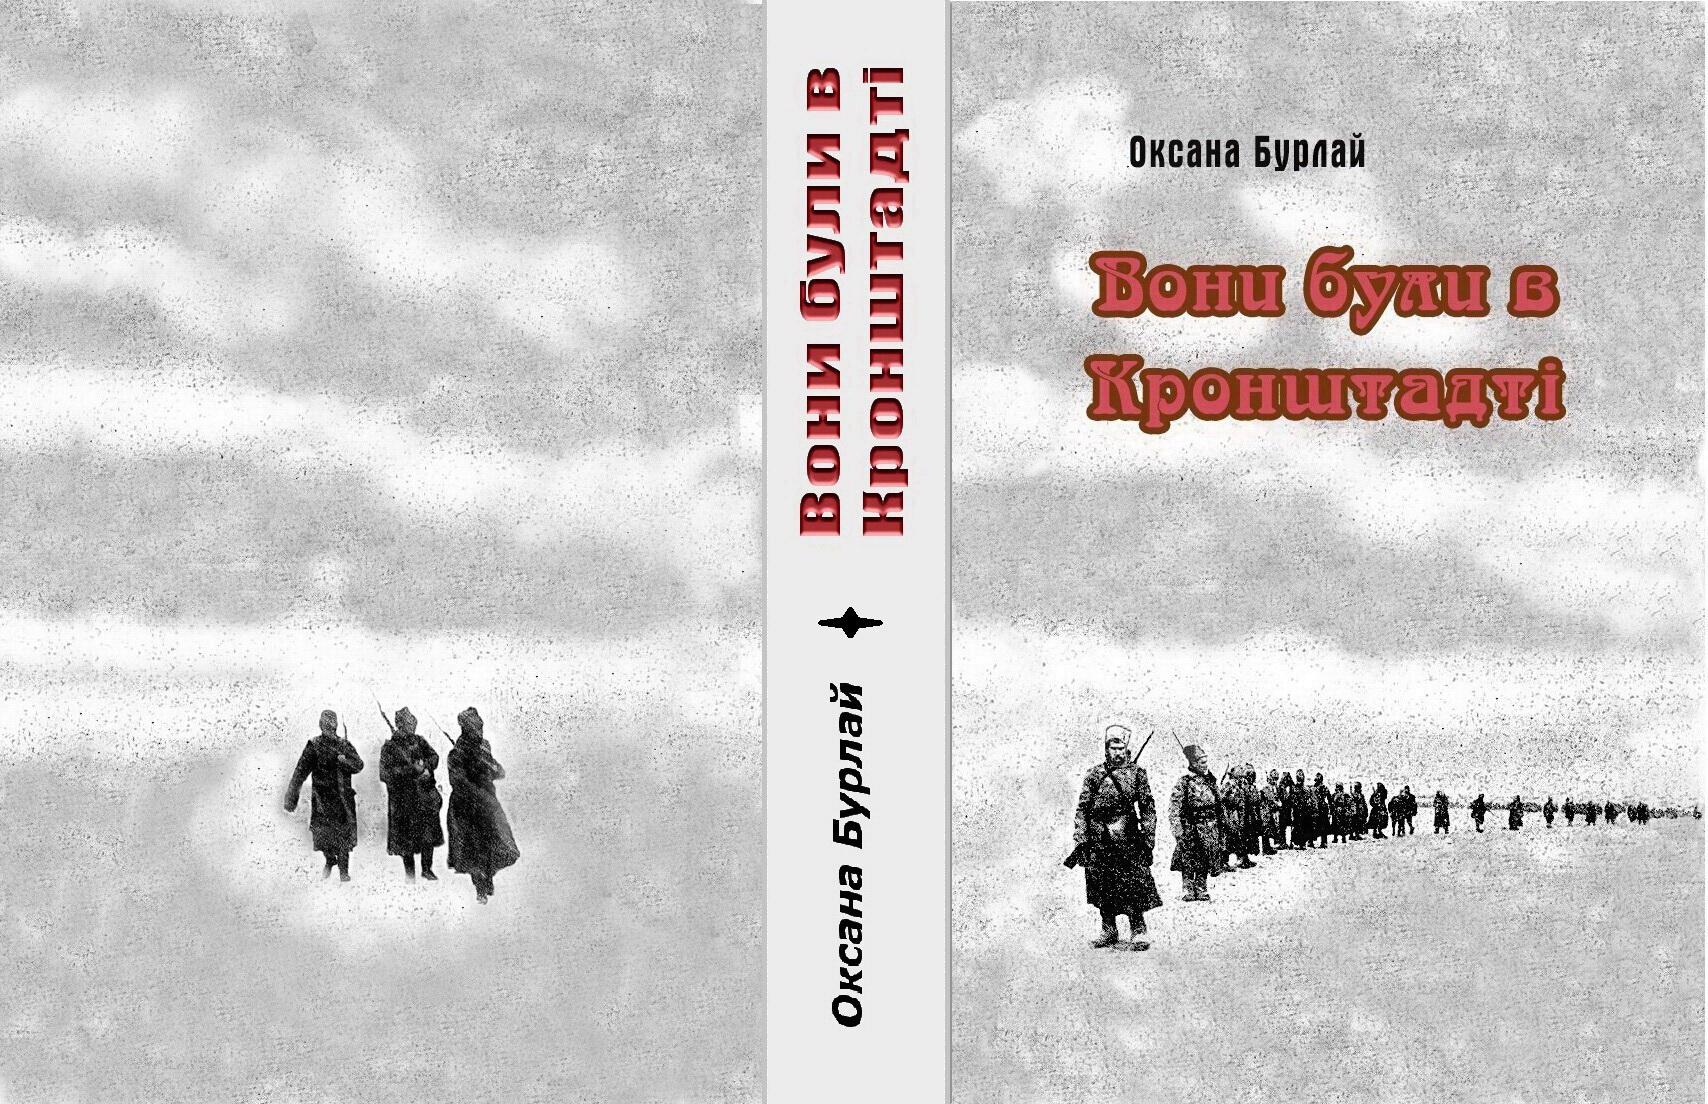 http://images.vfl.ru/ii/1596986211/4eb4b4de/31295691.jpg